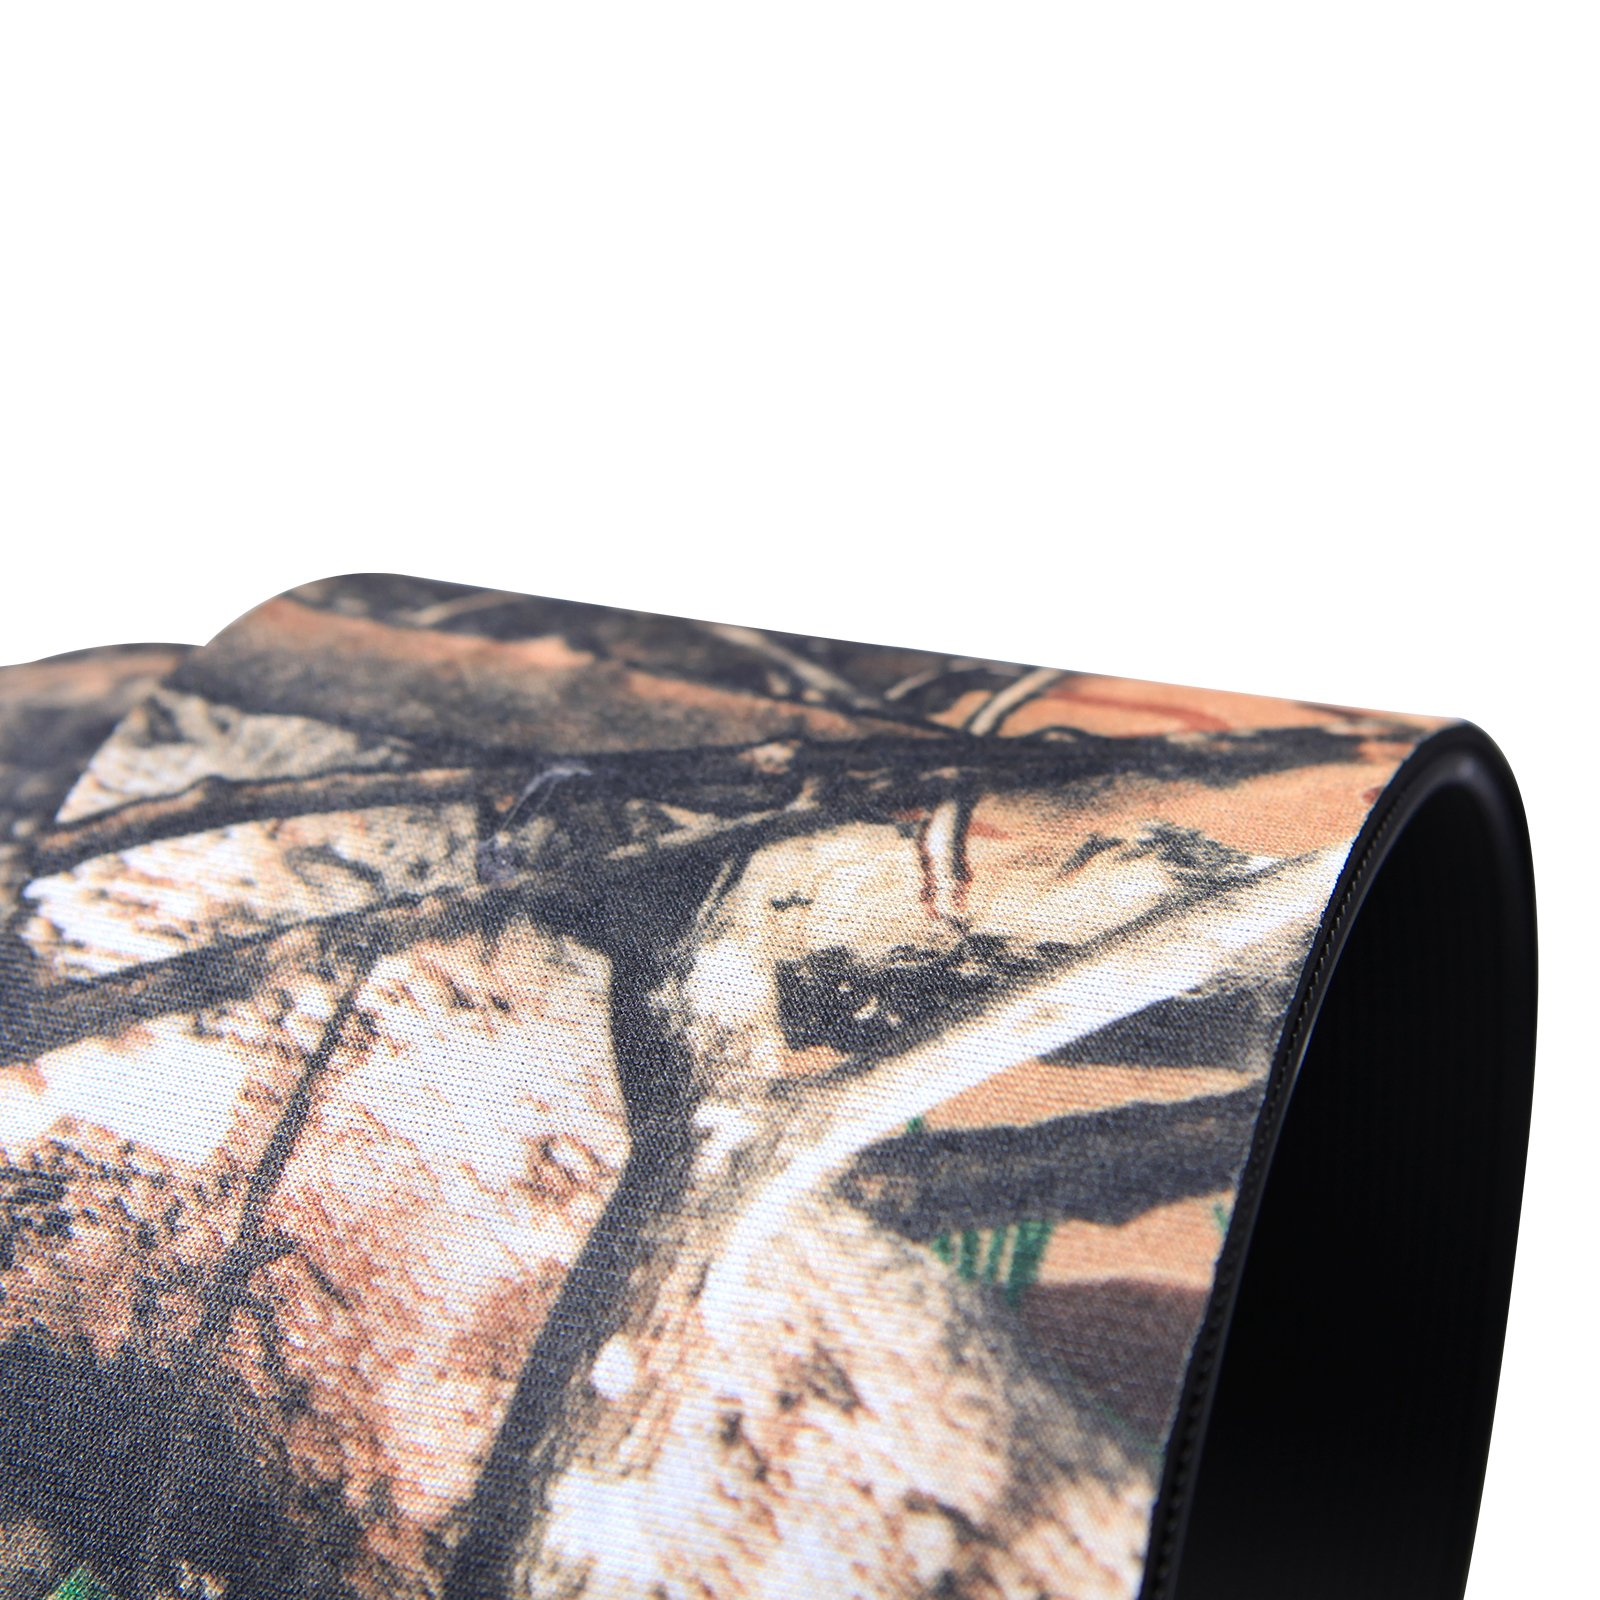 Mekingstudio Camera Lens Cover Protective for Sigma 150-600mm C - Forest Green Camo by Mekingstudio (Image #4)